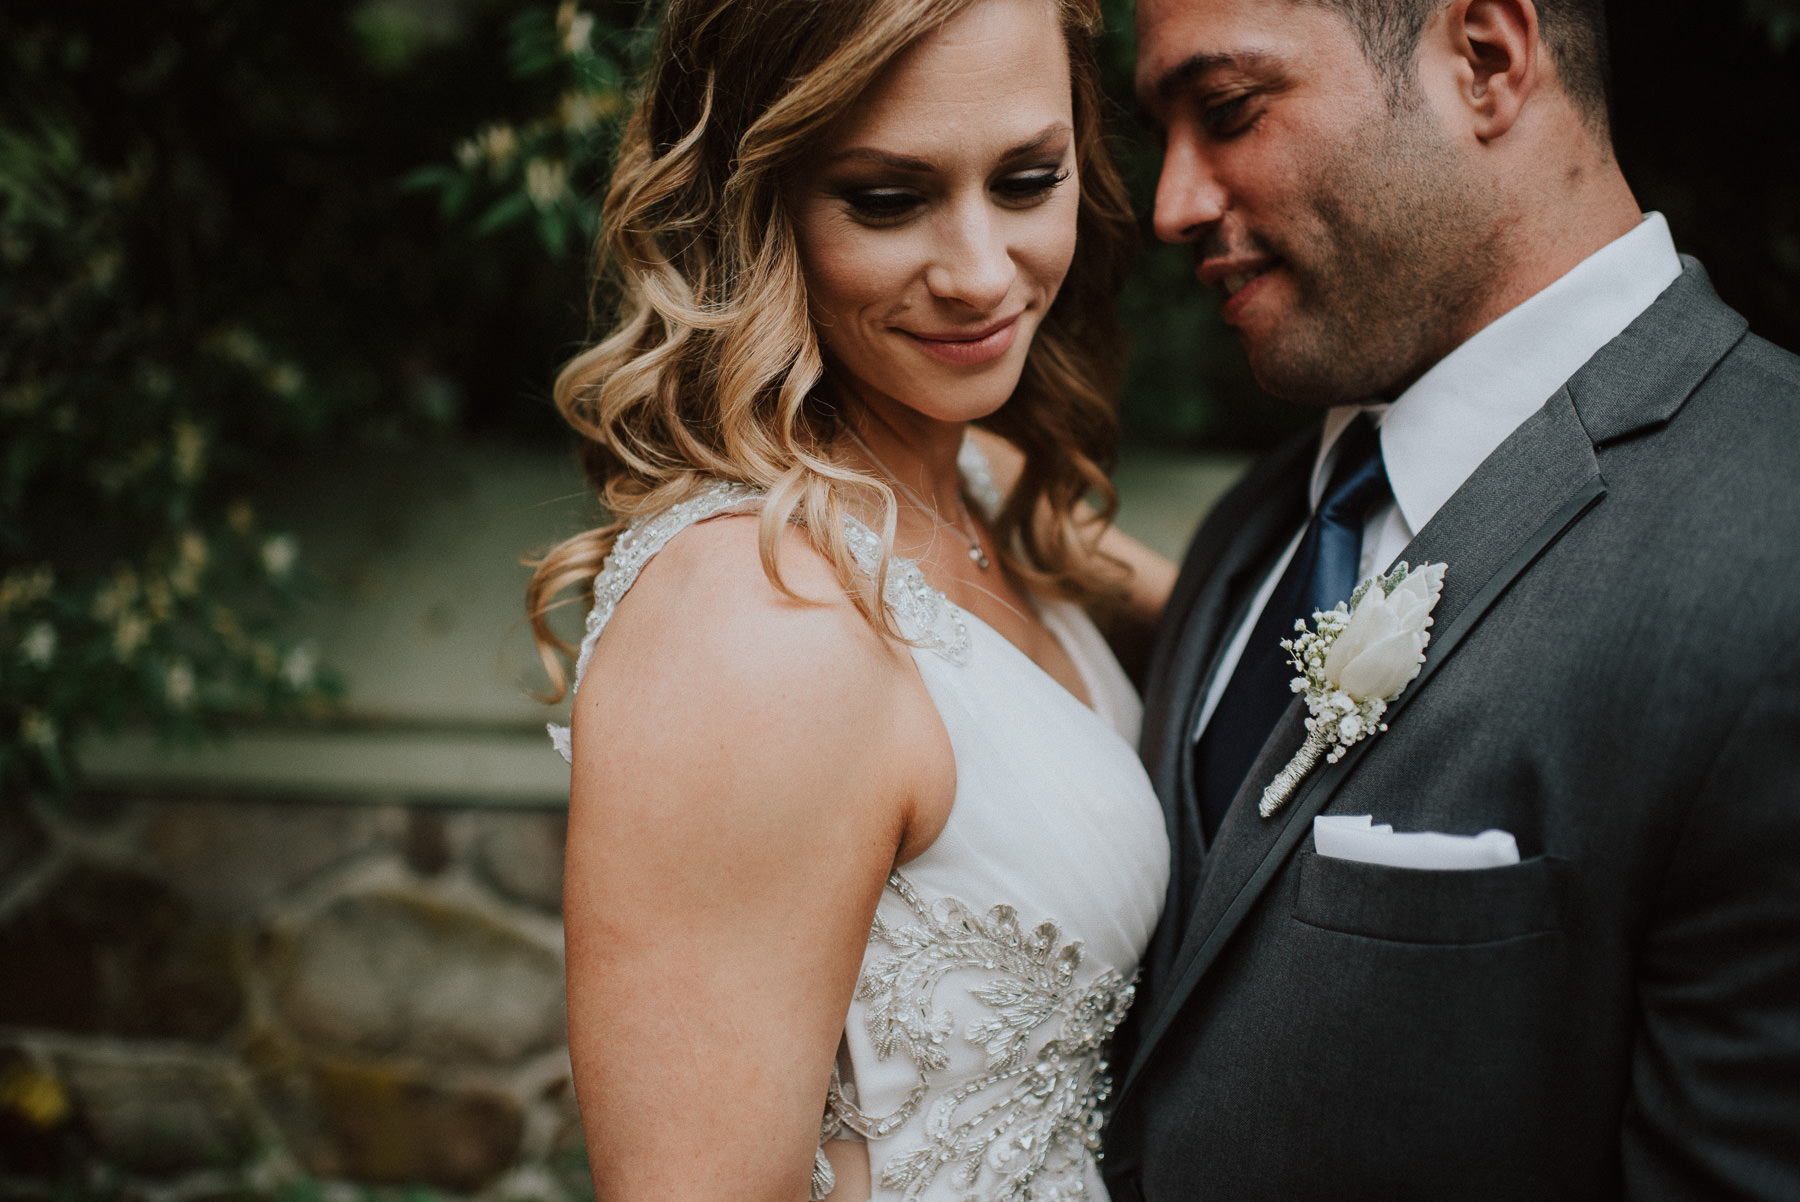 appleford-estate-wedding-photography-35.jpg